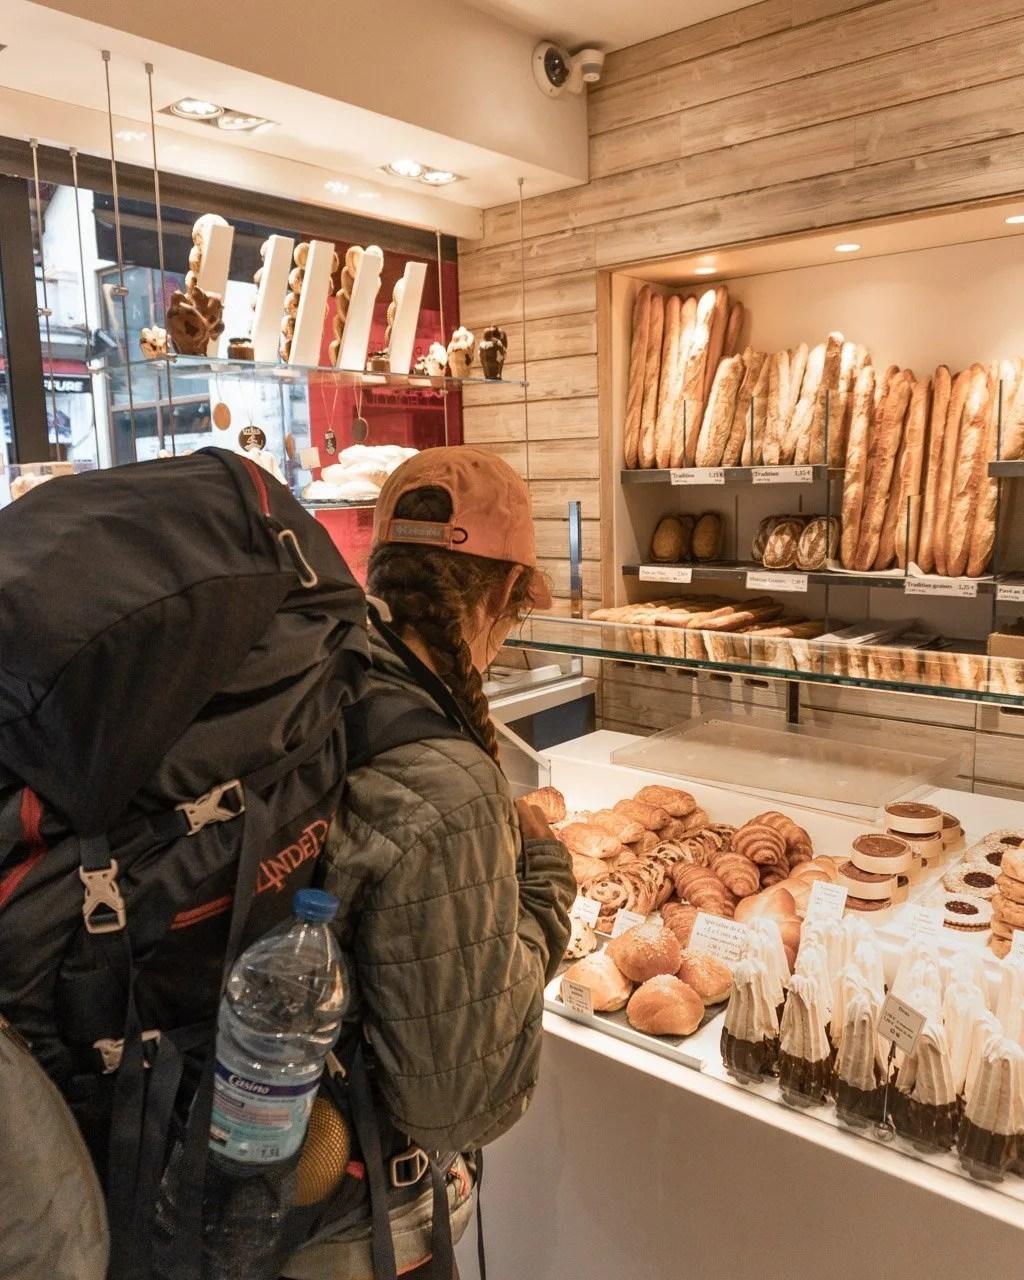 Boulangerie in Chamonix town on Tour du Mont Blanc Hike